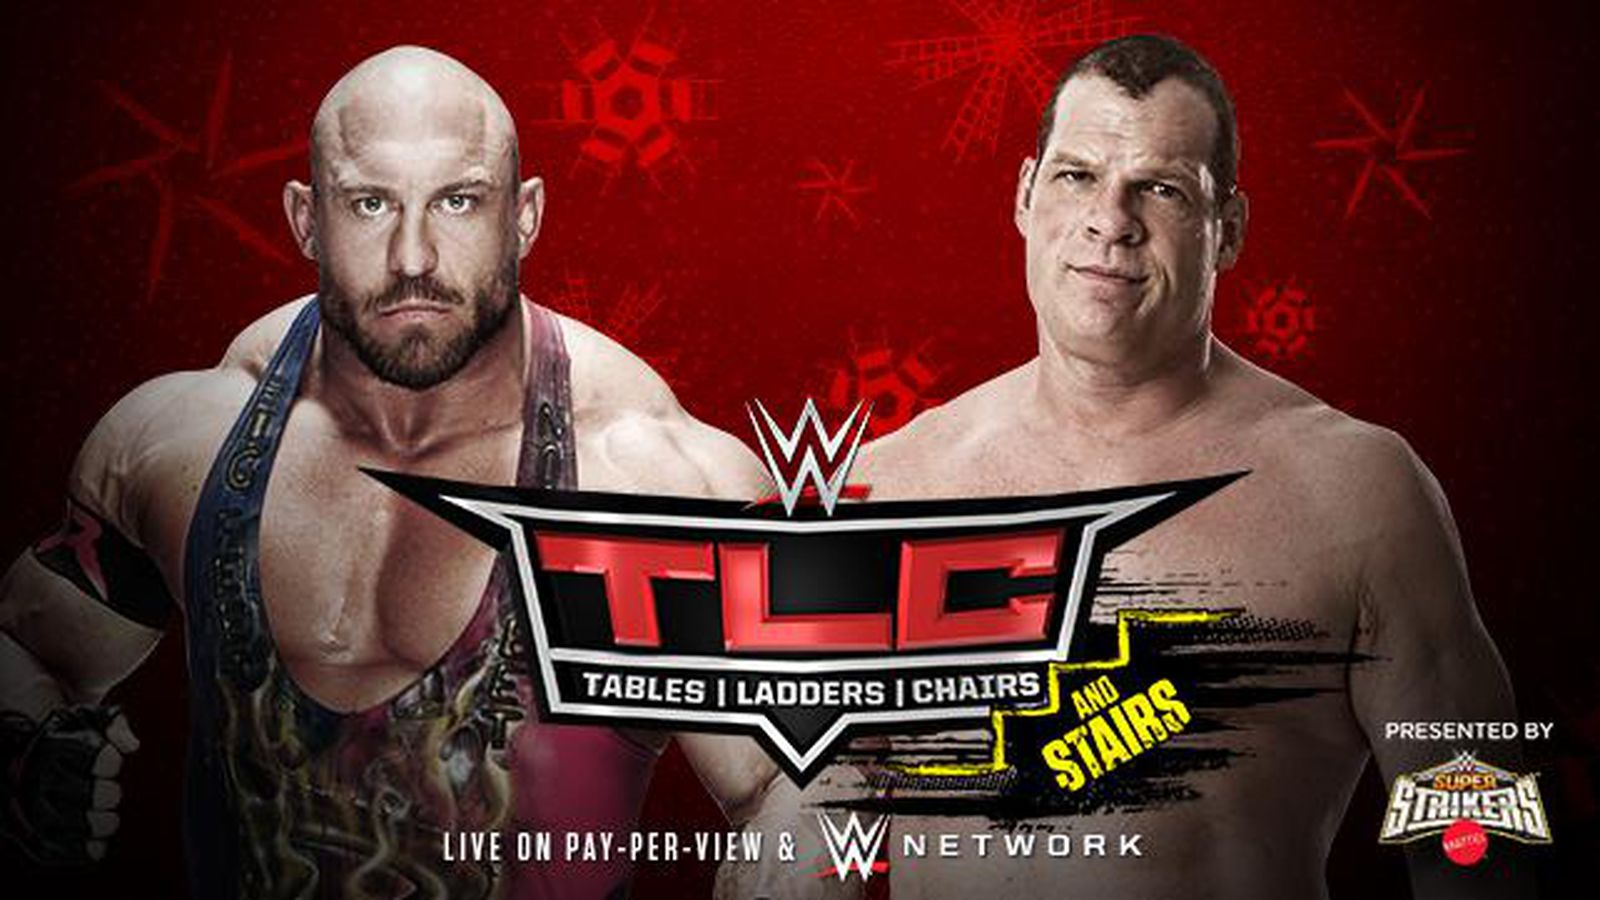 WWE TLC 2014 match card preview Ryback vs Kane